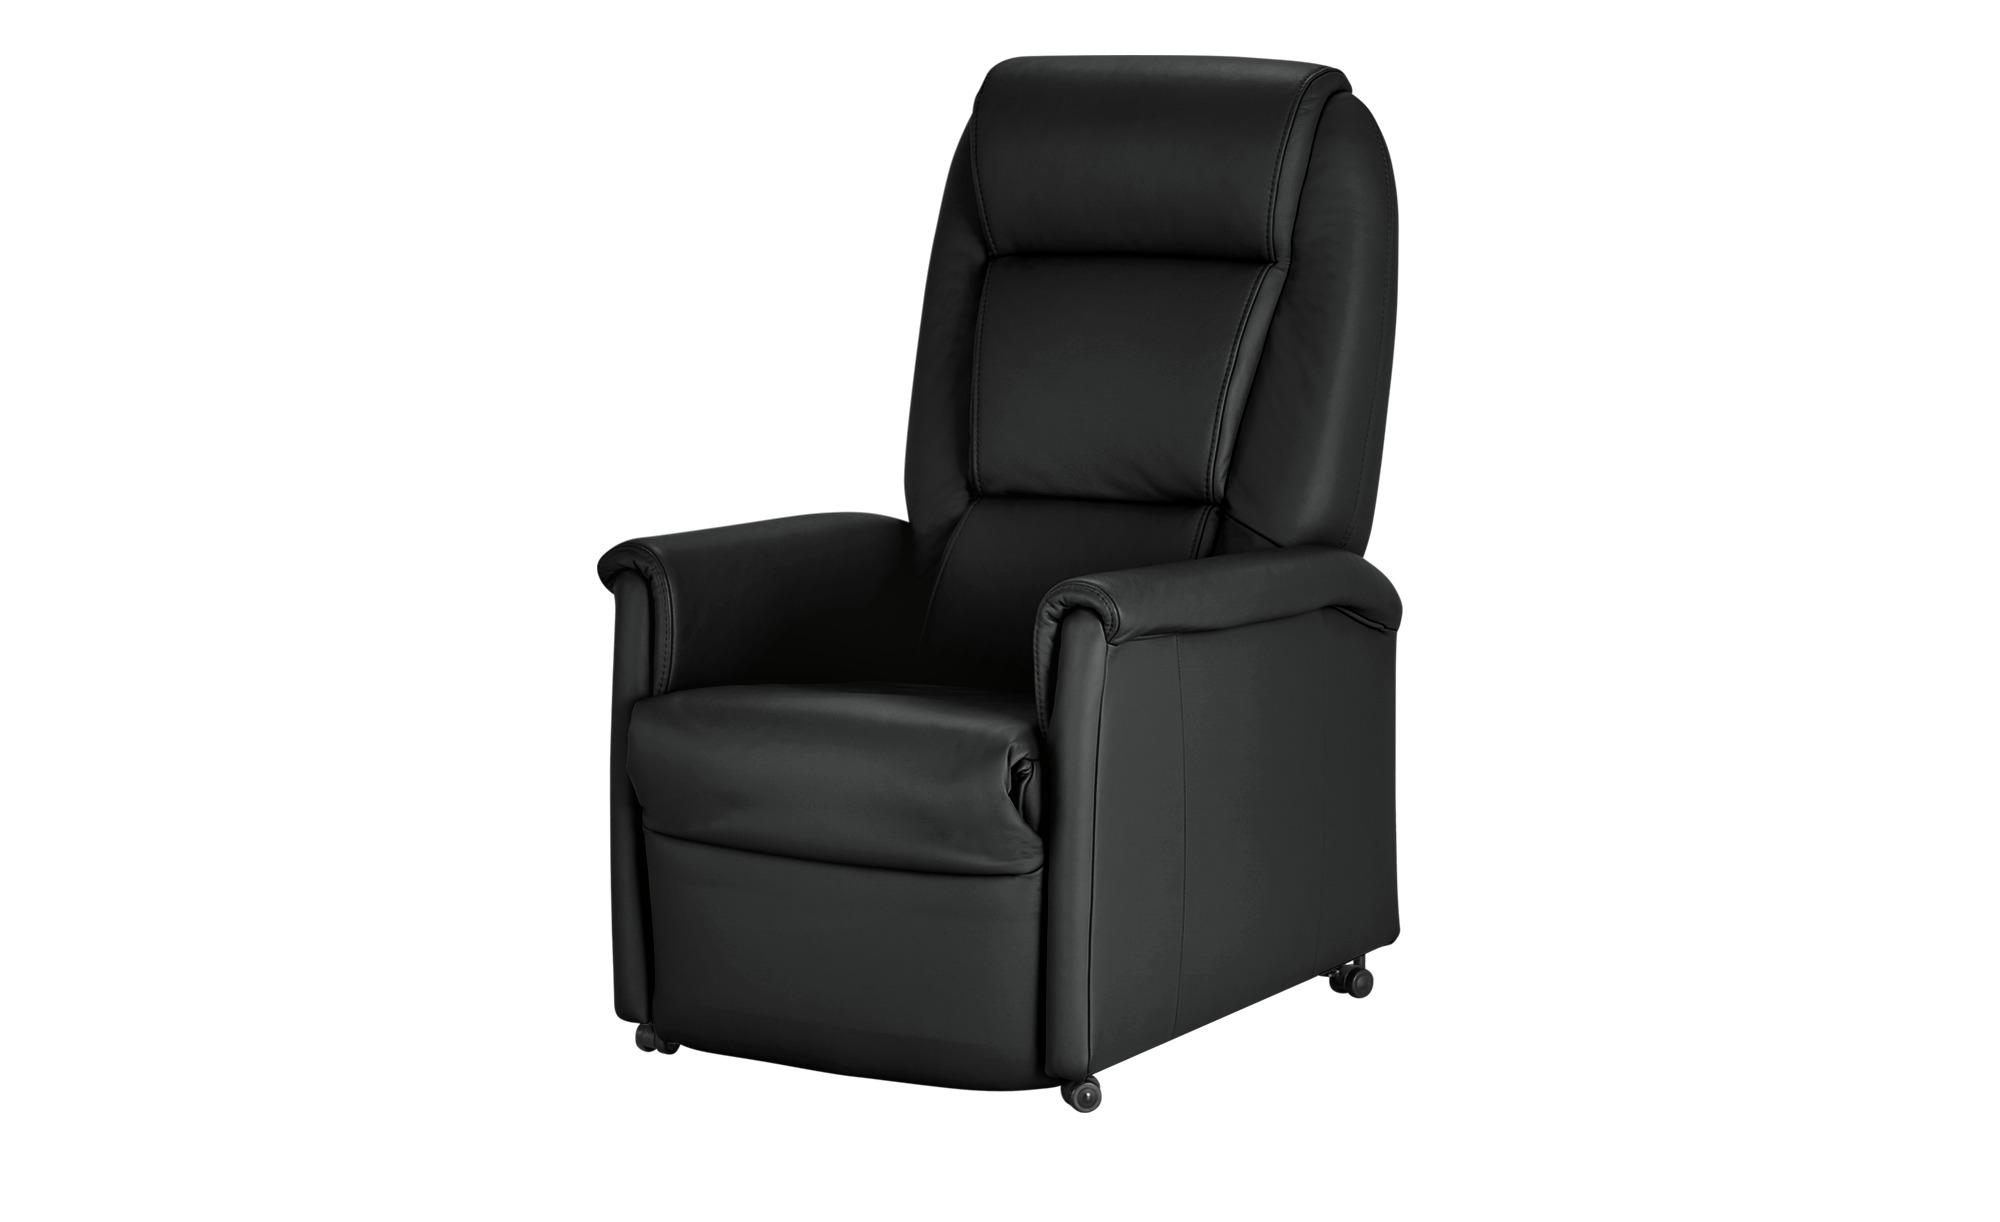 himolla Fernsehsessel schwarz - Leder 9773 ¦ schwarz ¦ Maße (cm): B: 69 H: 105 T: 82 Polstermöbel > Sessel > Fernsehsessel - Höffner